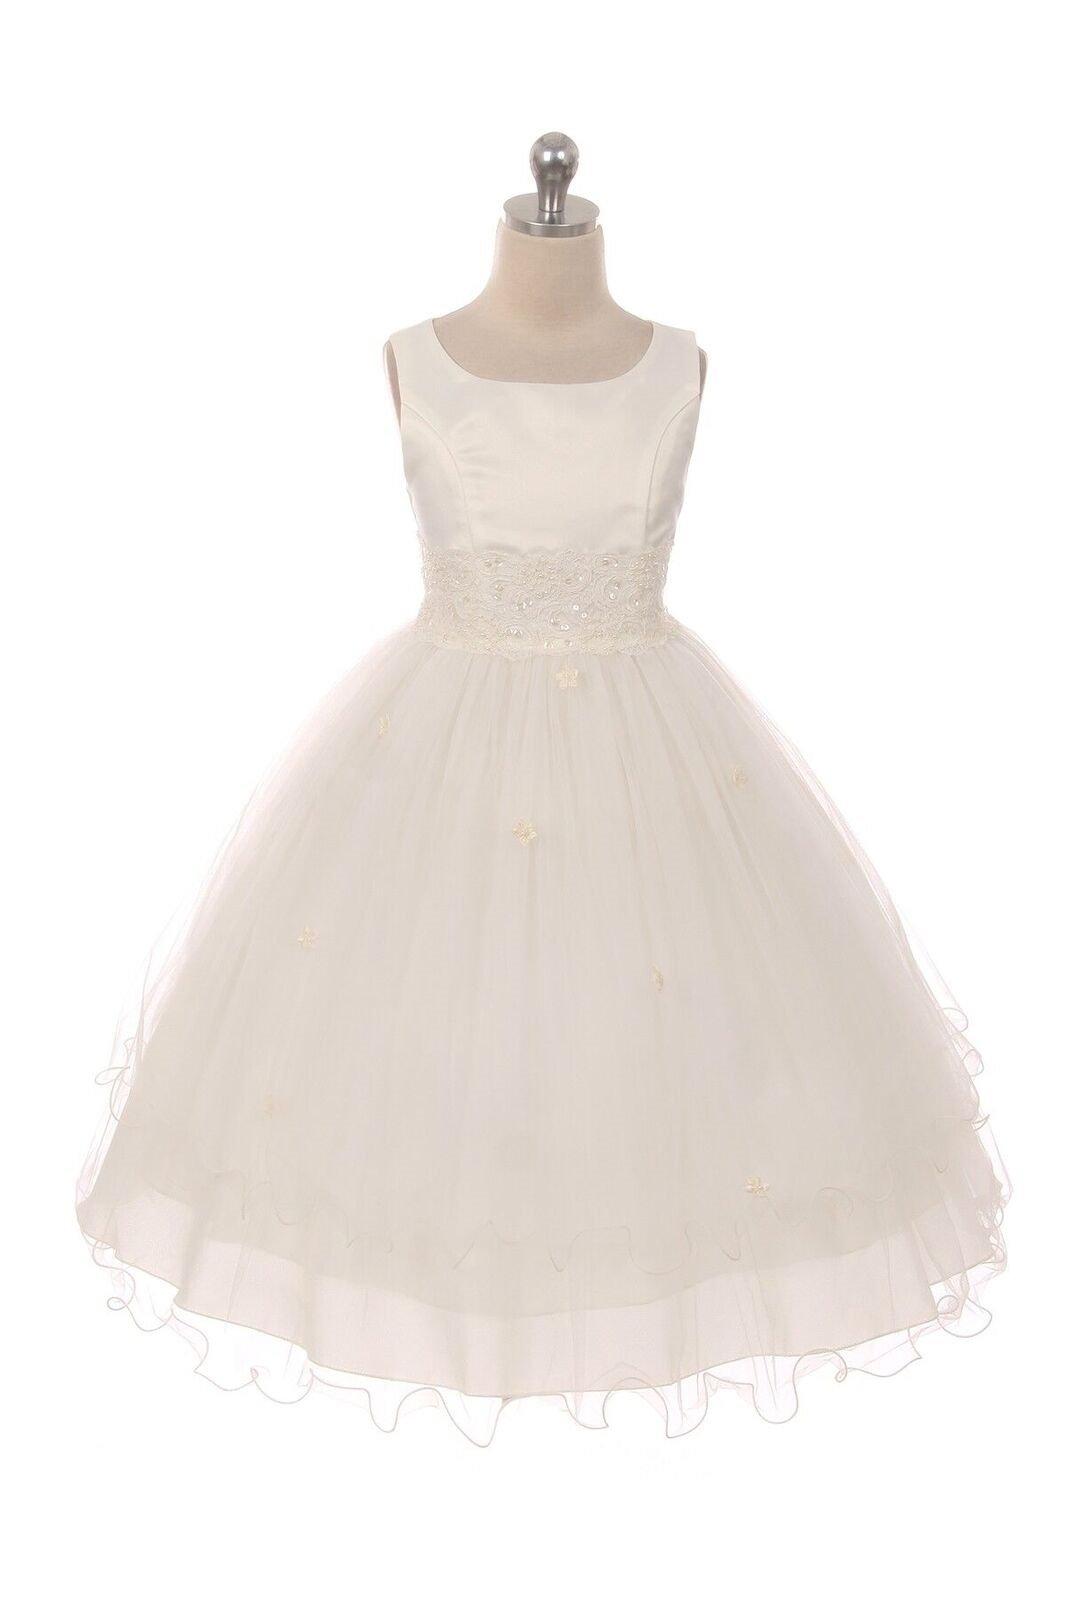 Kid's Dream Flower Girl Communion Dress for Girls - Satin Tulle Dress with Elegant Lace Trim - Size 8, Ivory